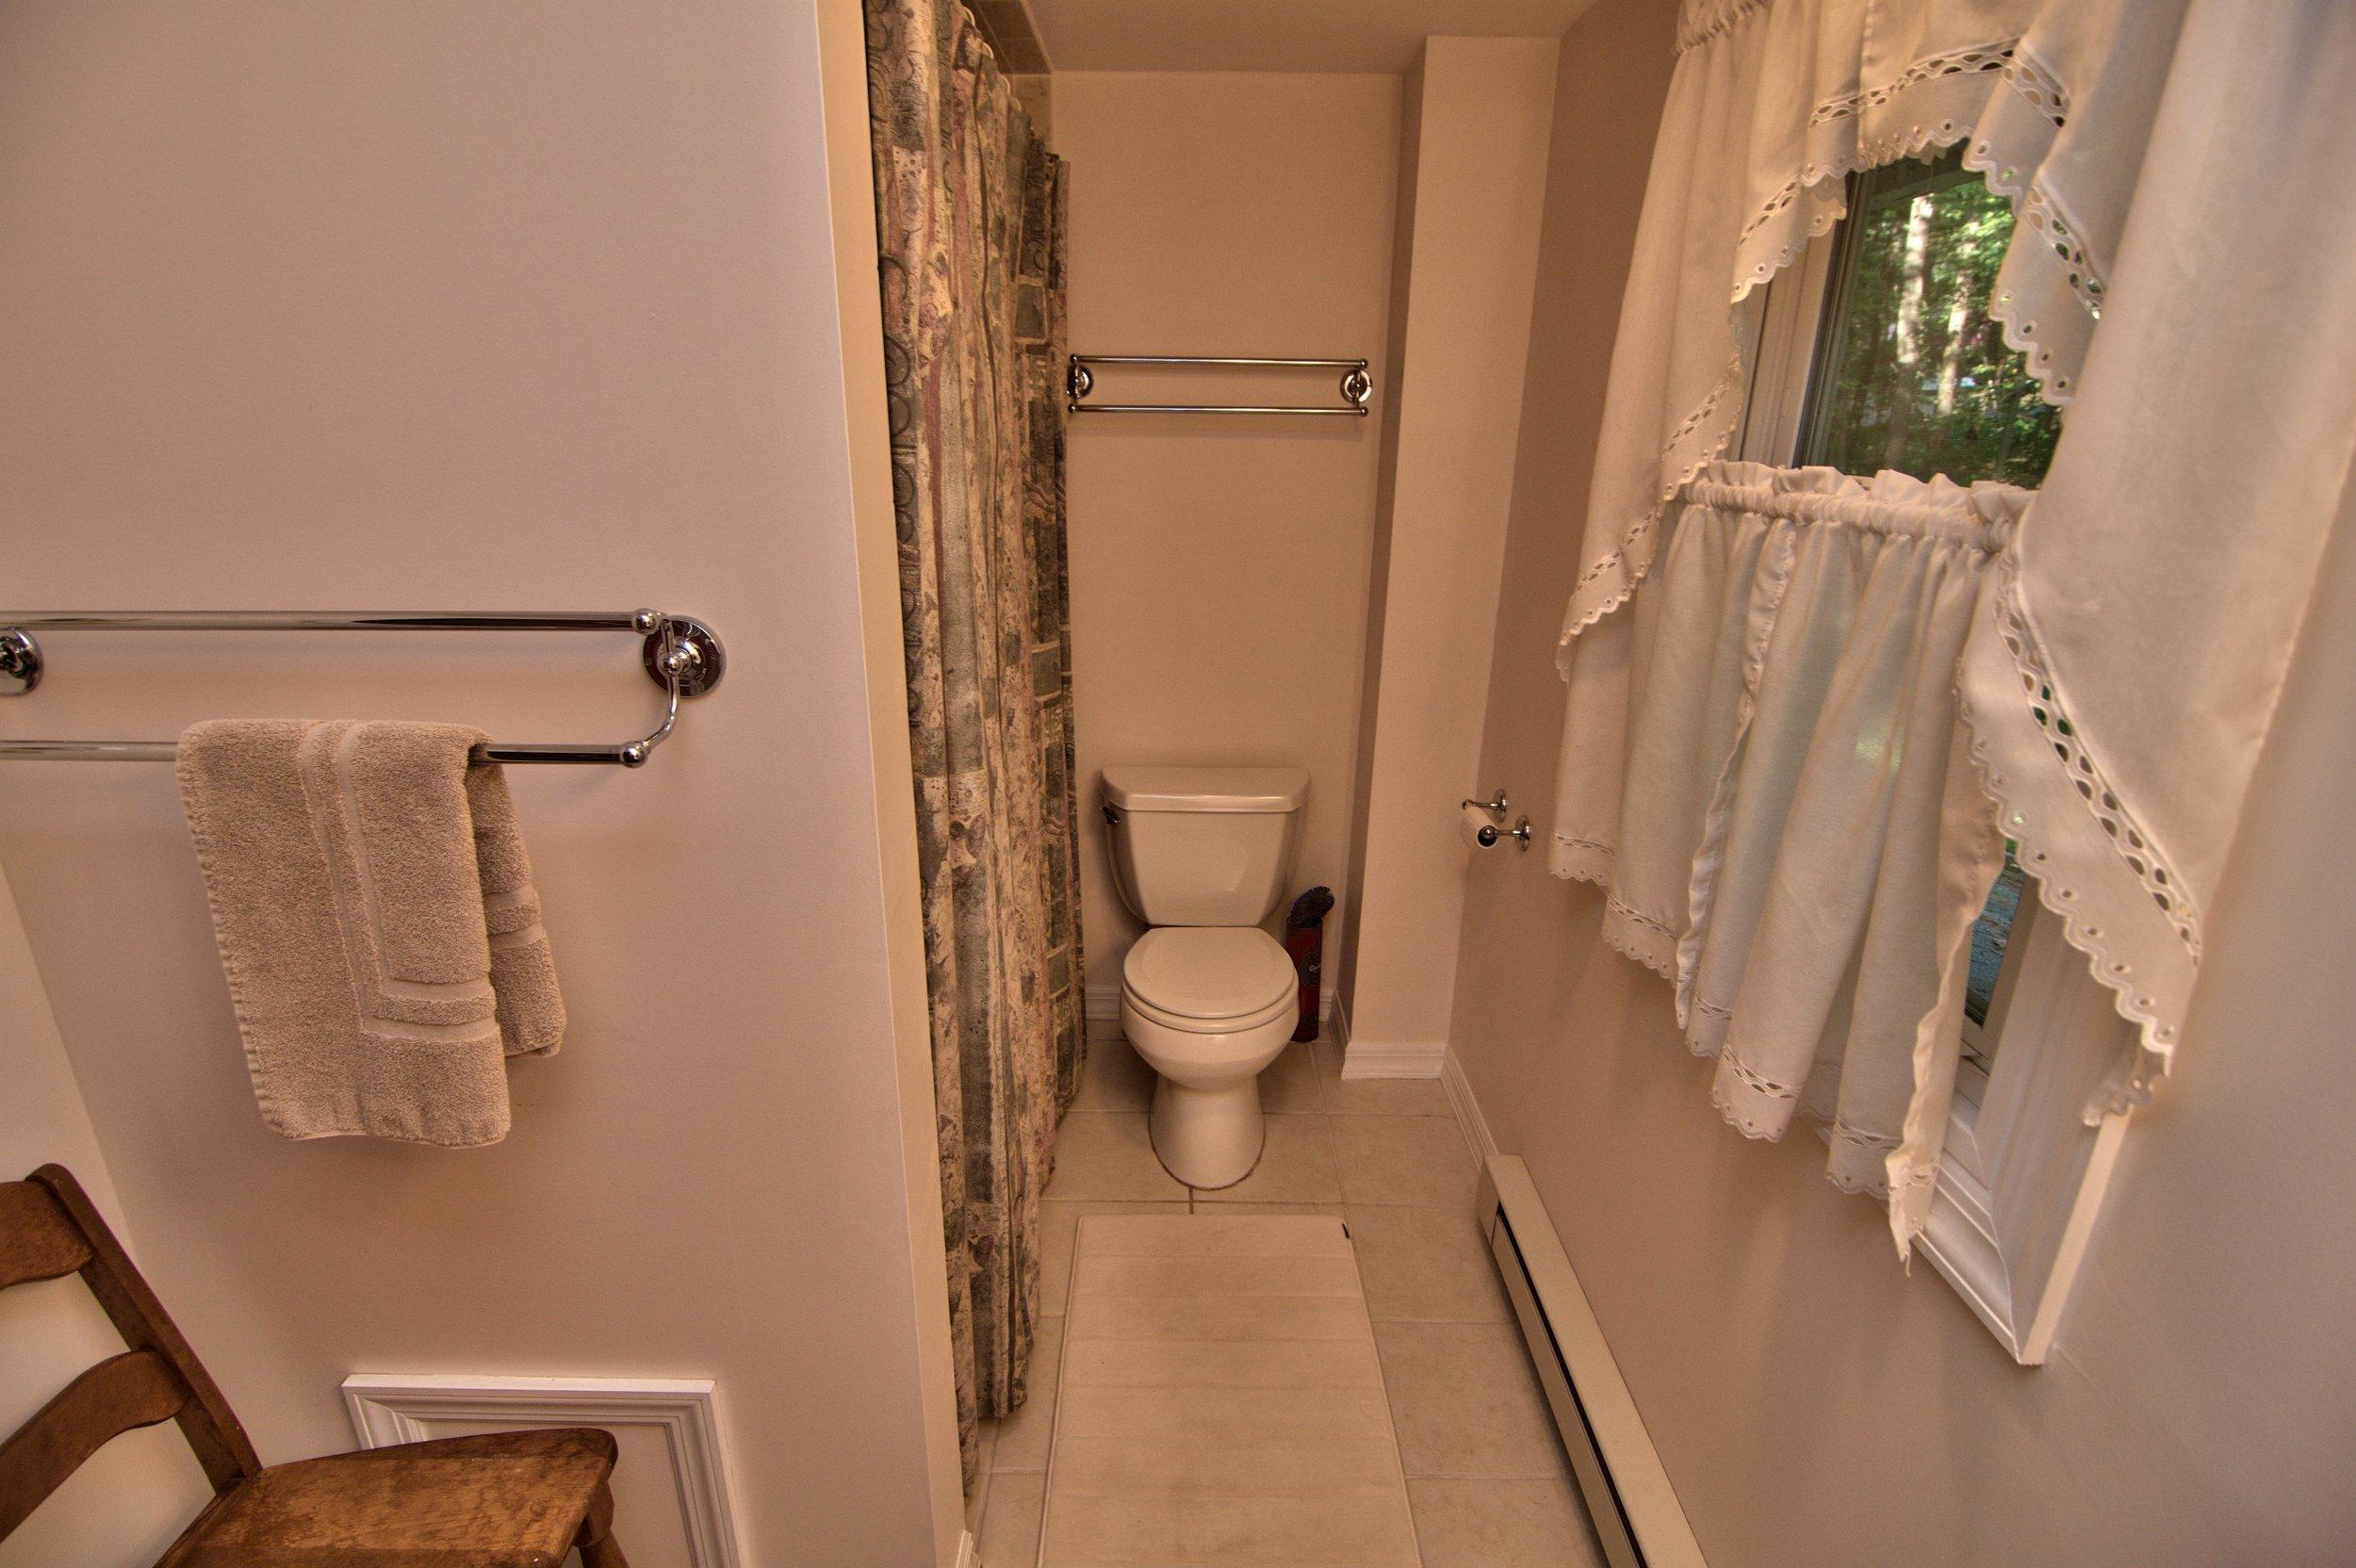 Hall Bath 2 View 2.jpg